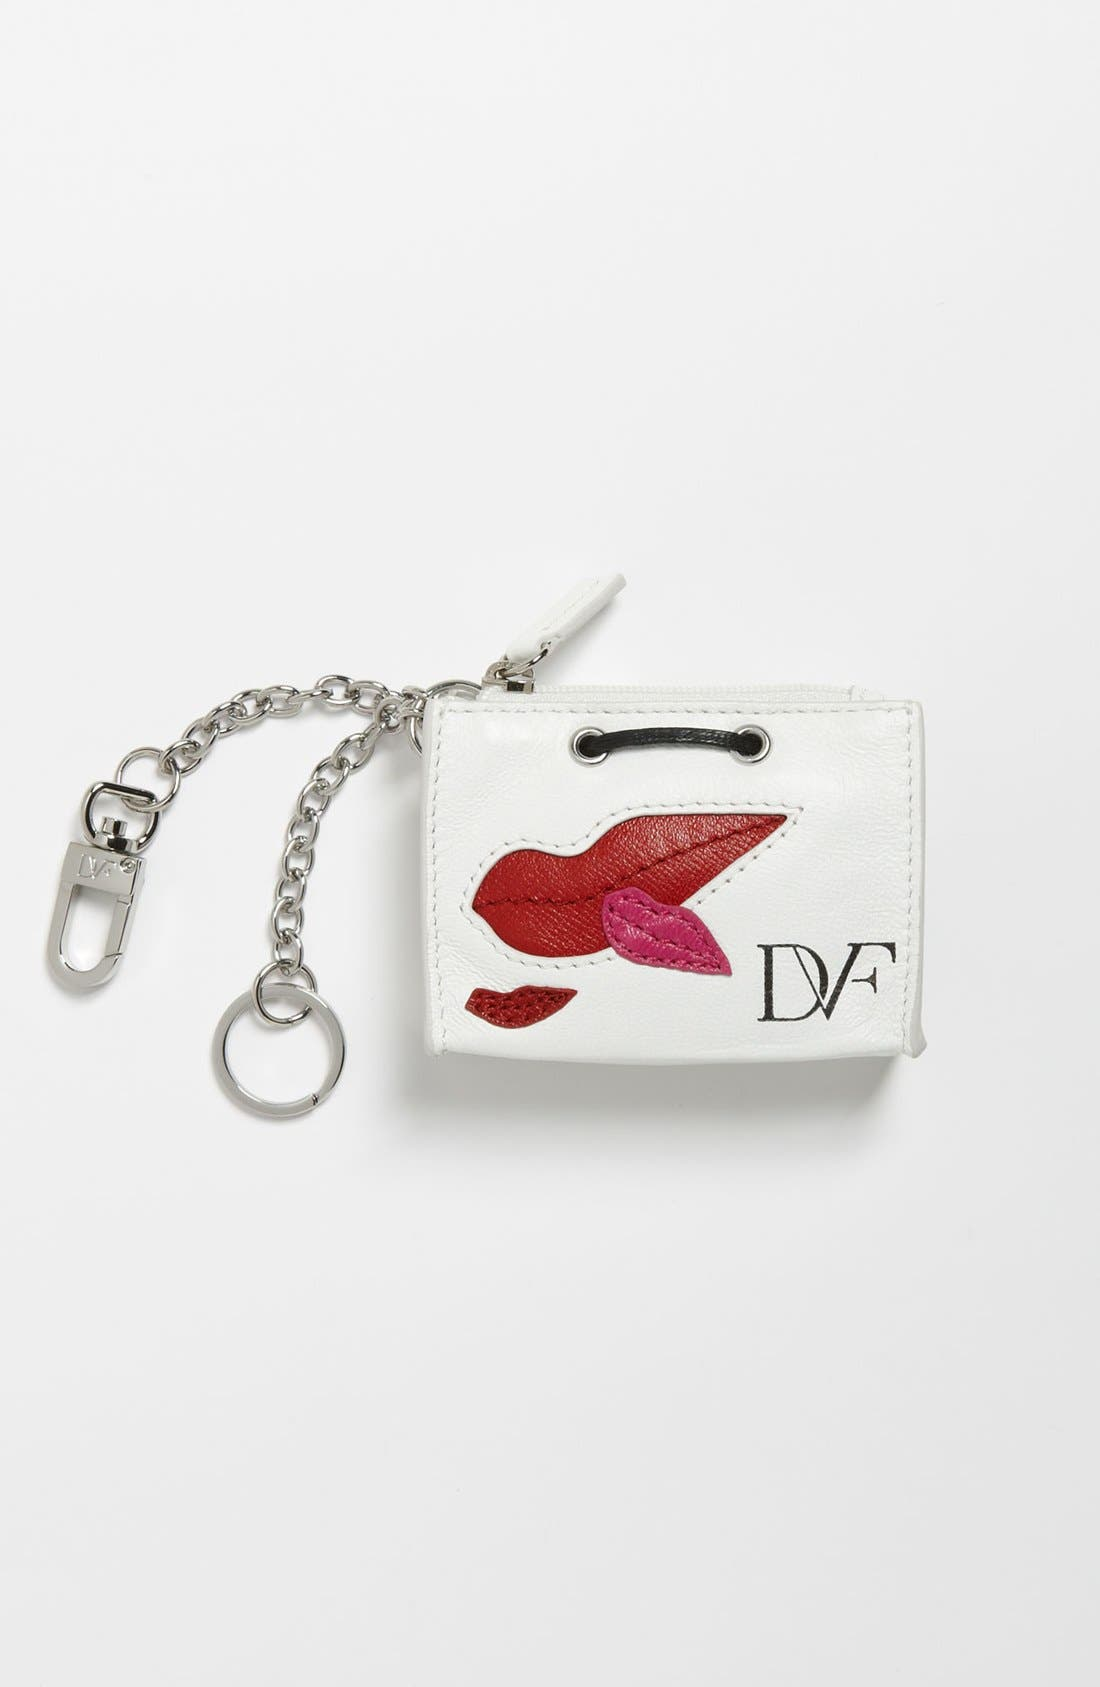 Alternate Image 1 Selected - Diane von Furstenberg Shopping Bag Key Fob